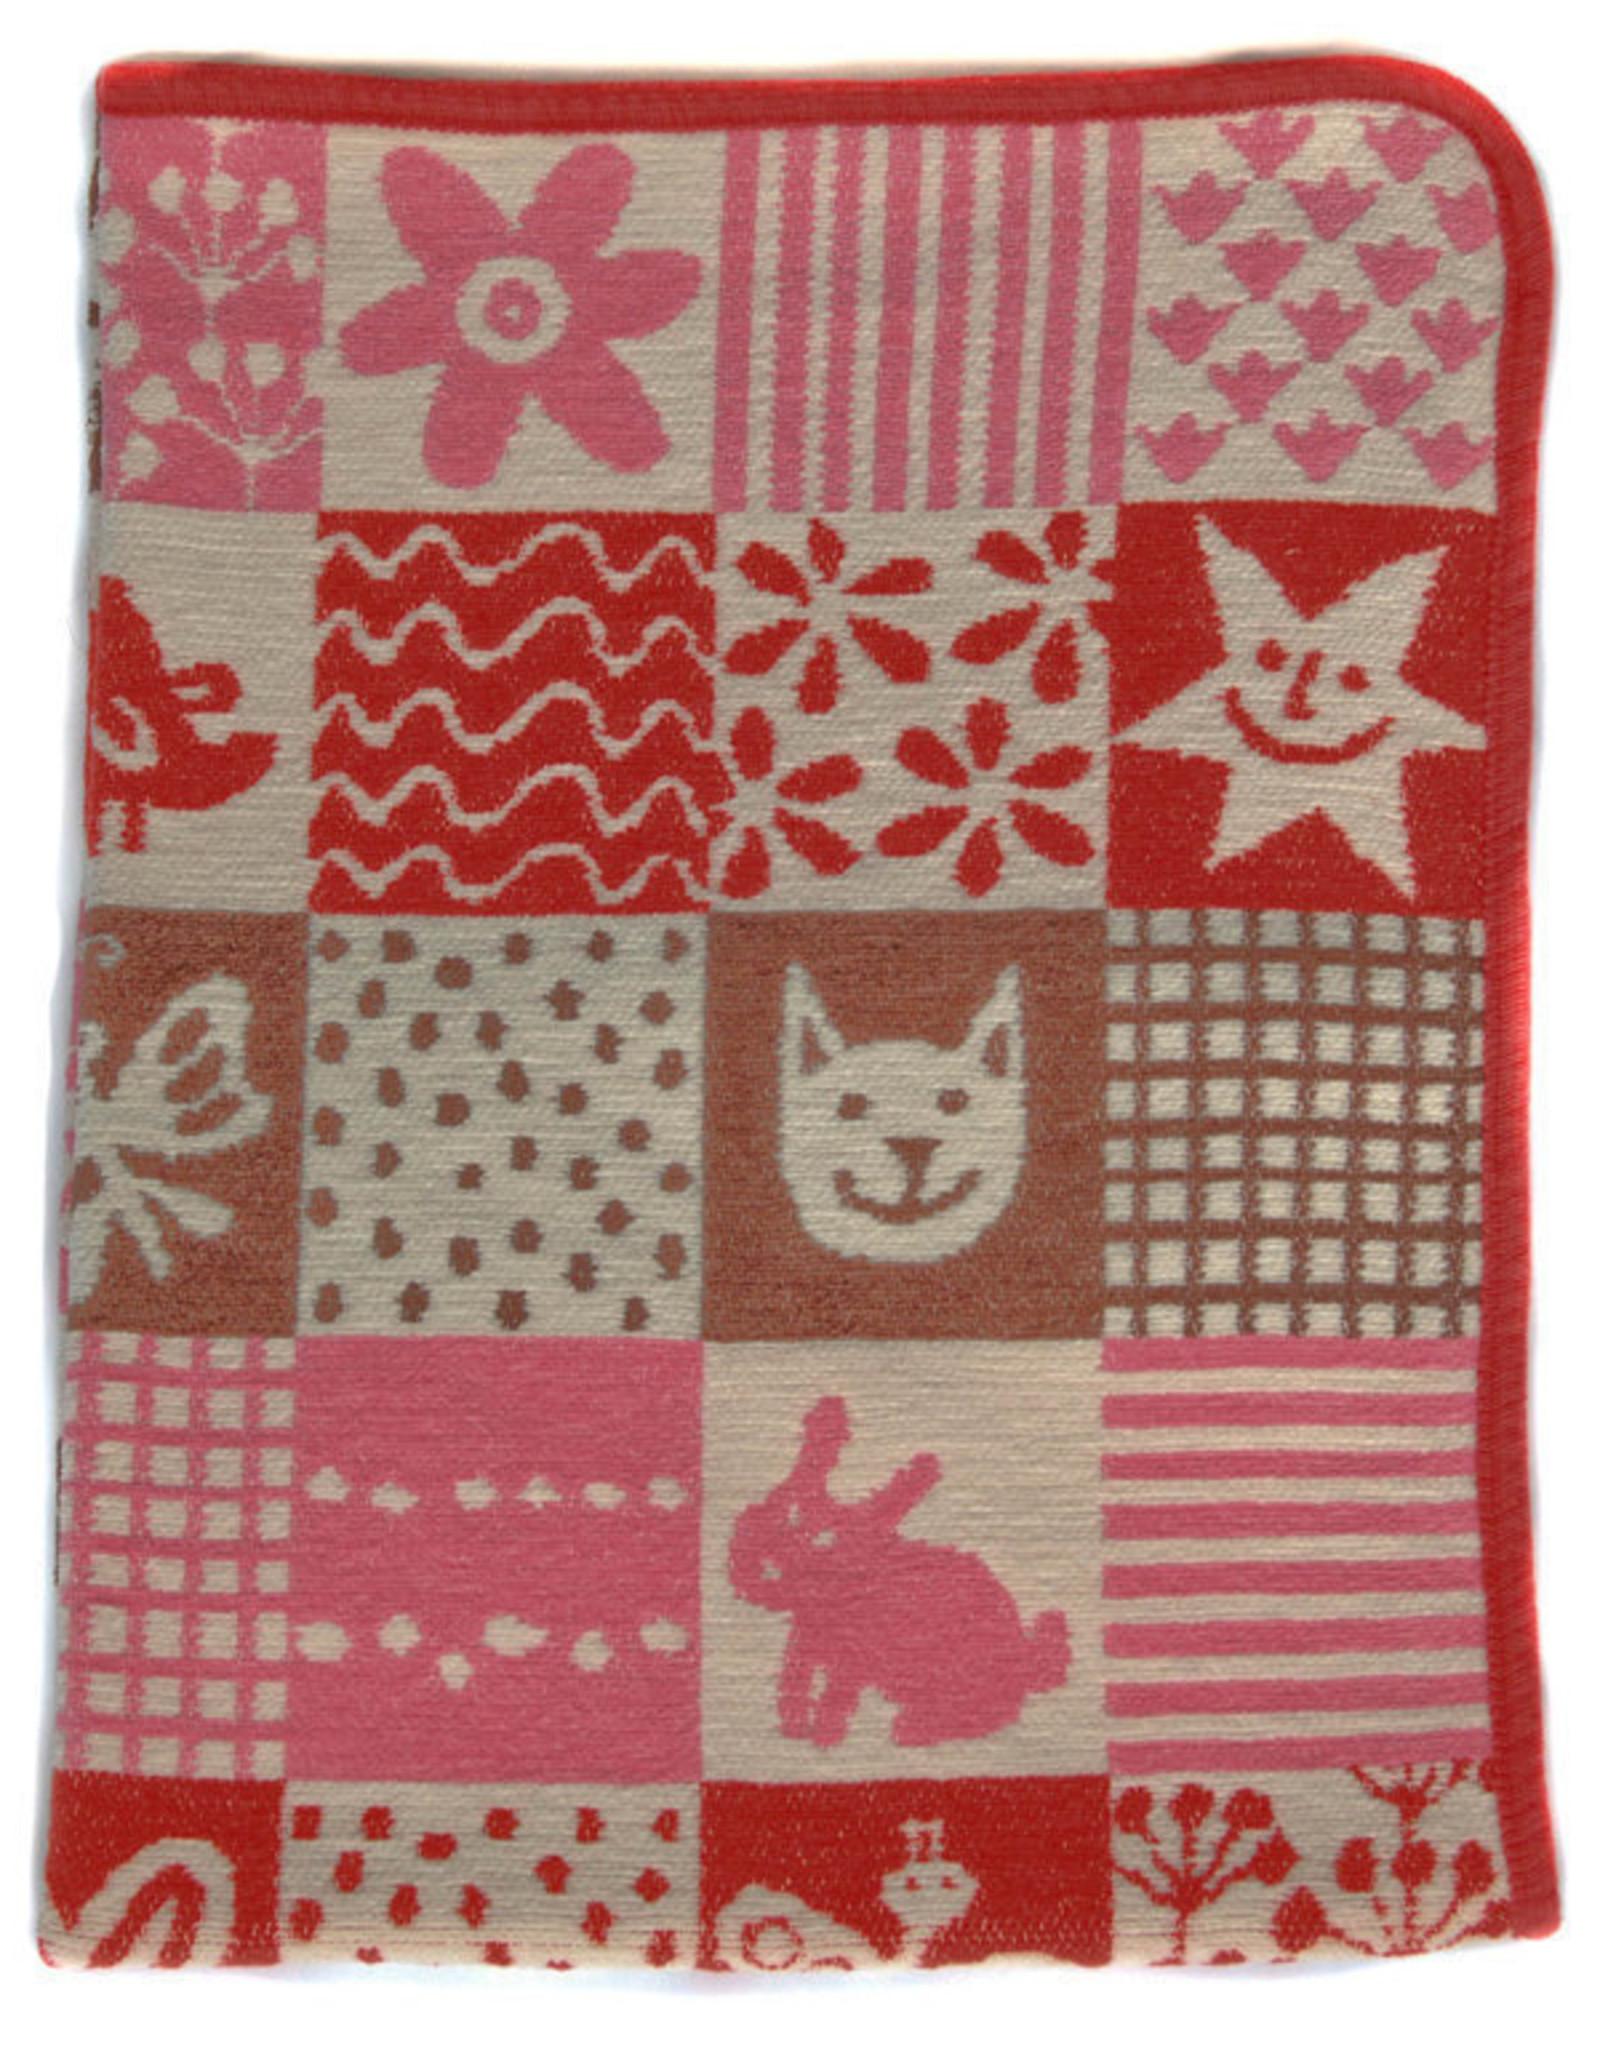 Klippan Klippan Wiegdeken Chenille Katoen Quilt Roze/Rood/Bruin 70x90